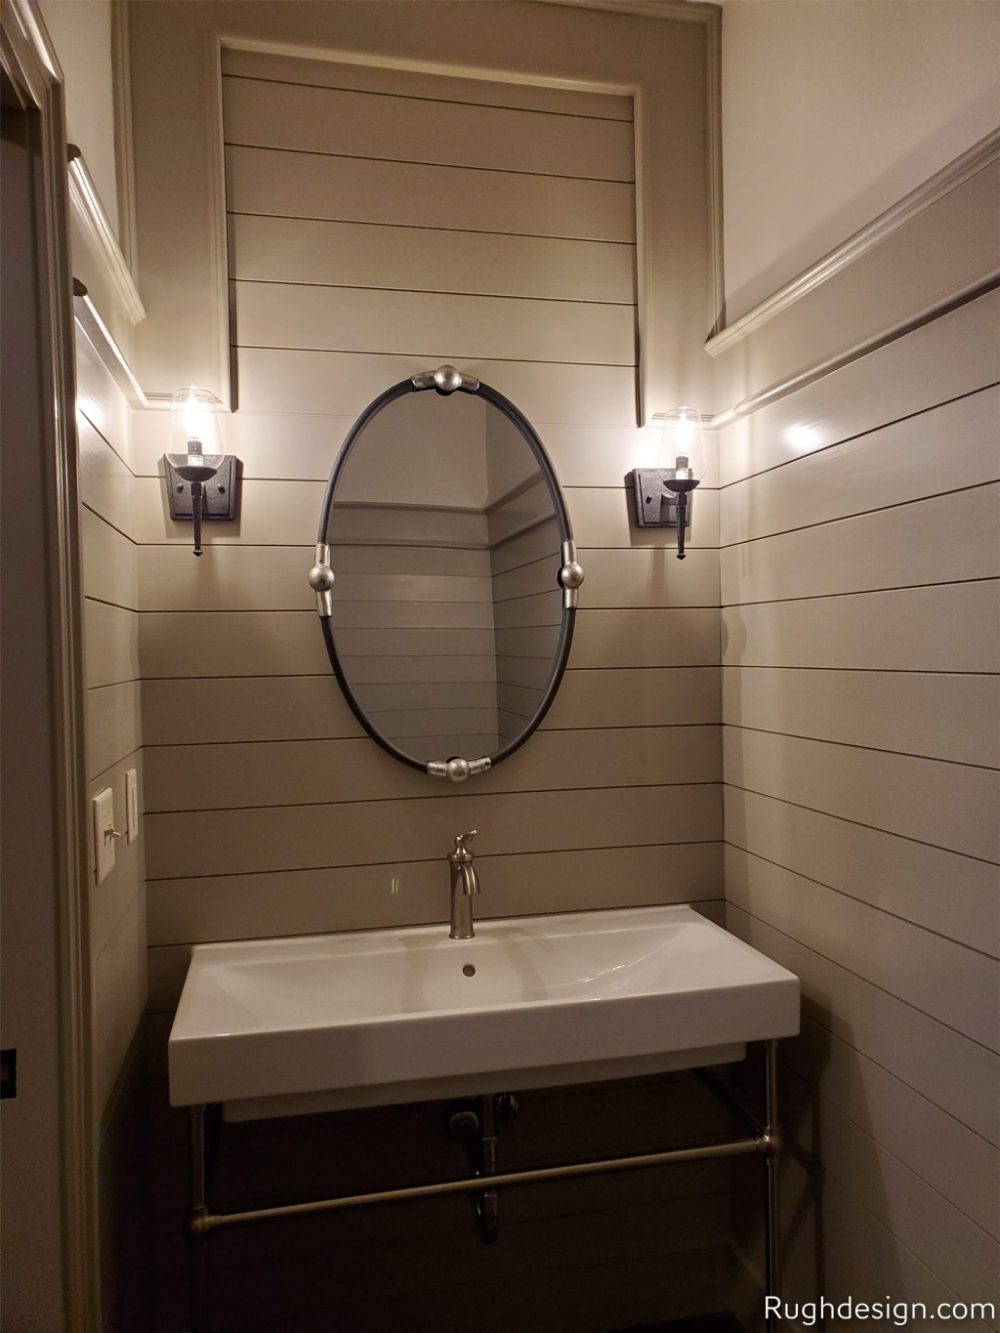 Worldly Gray SW 7043 used in a bathroom 1000x1333 - Portfolio